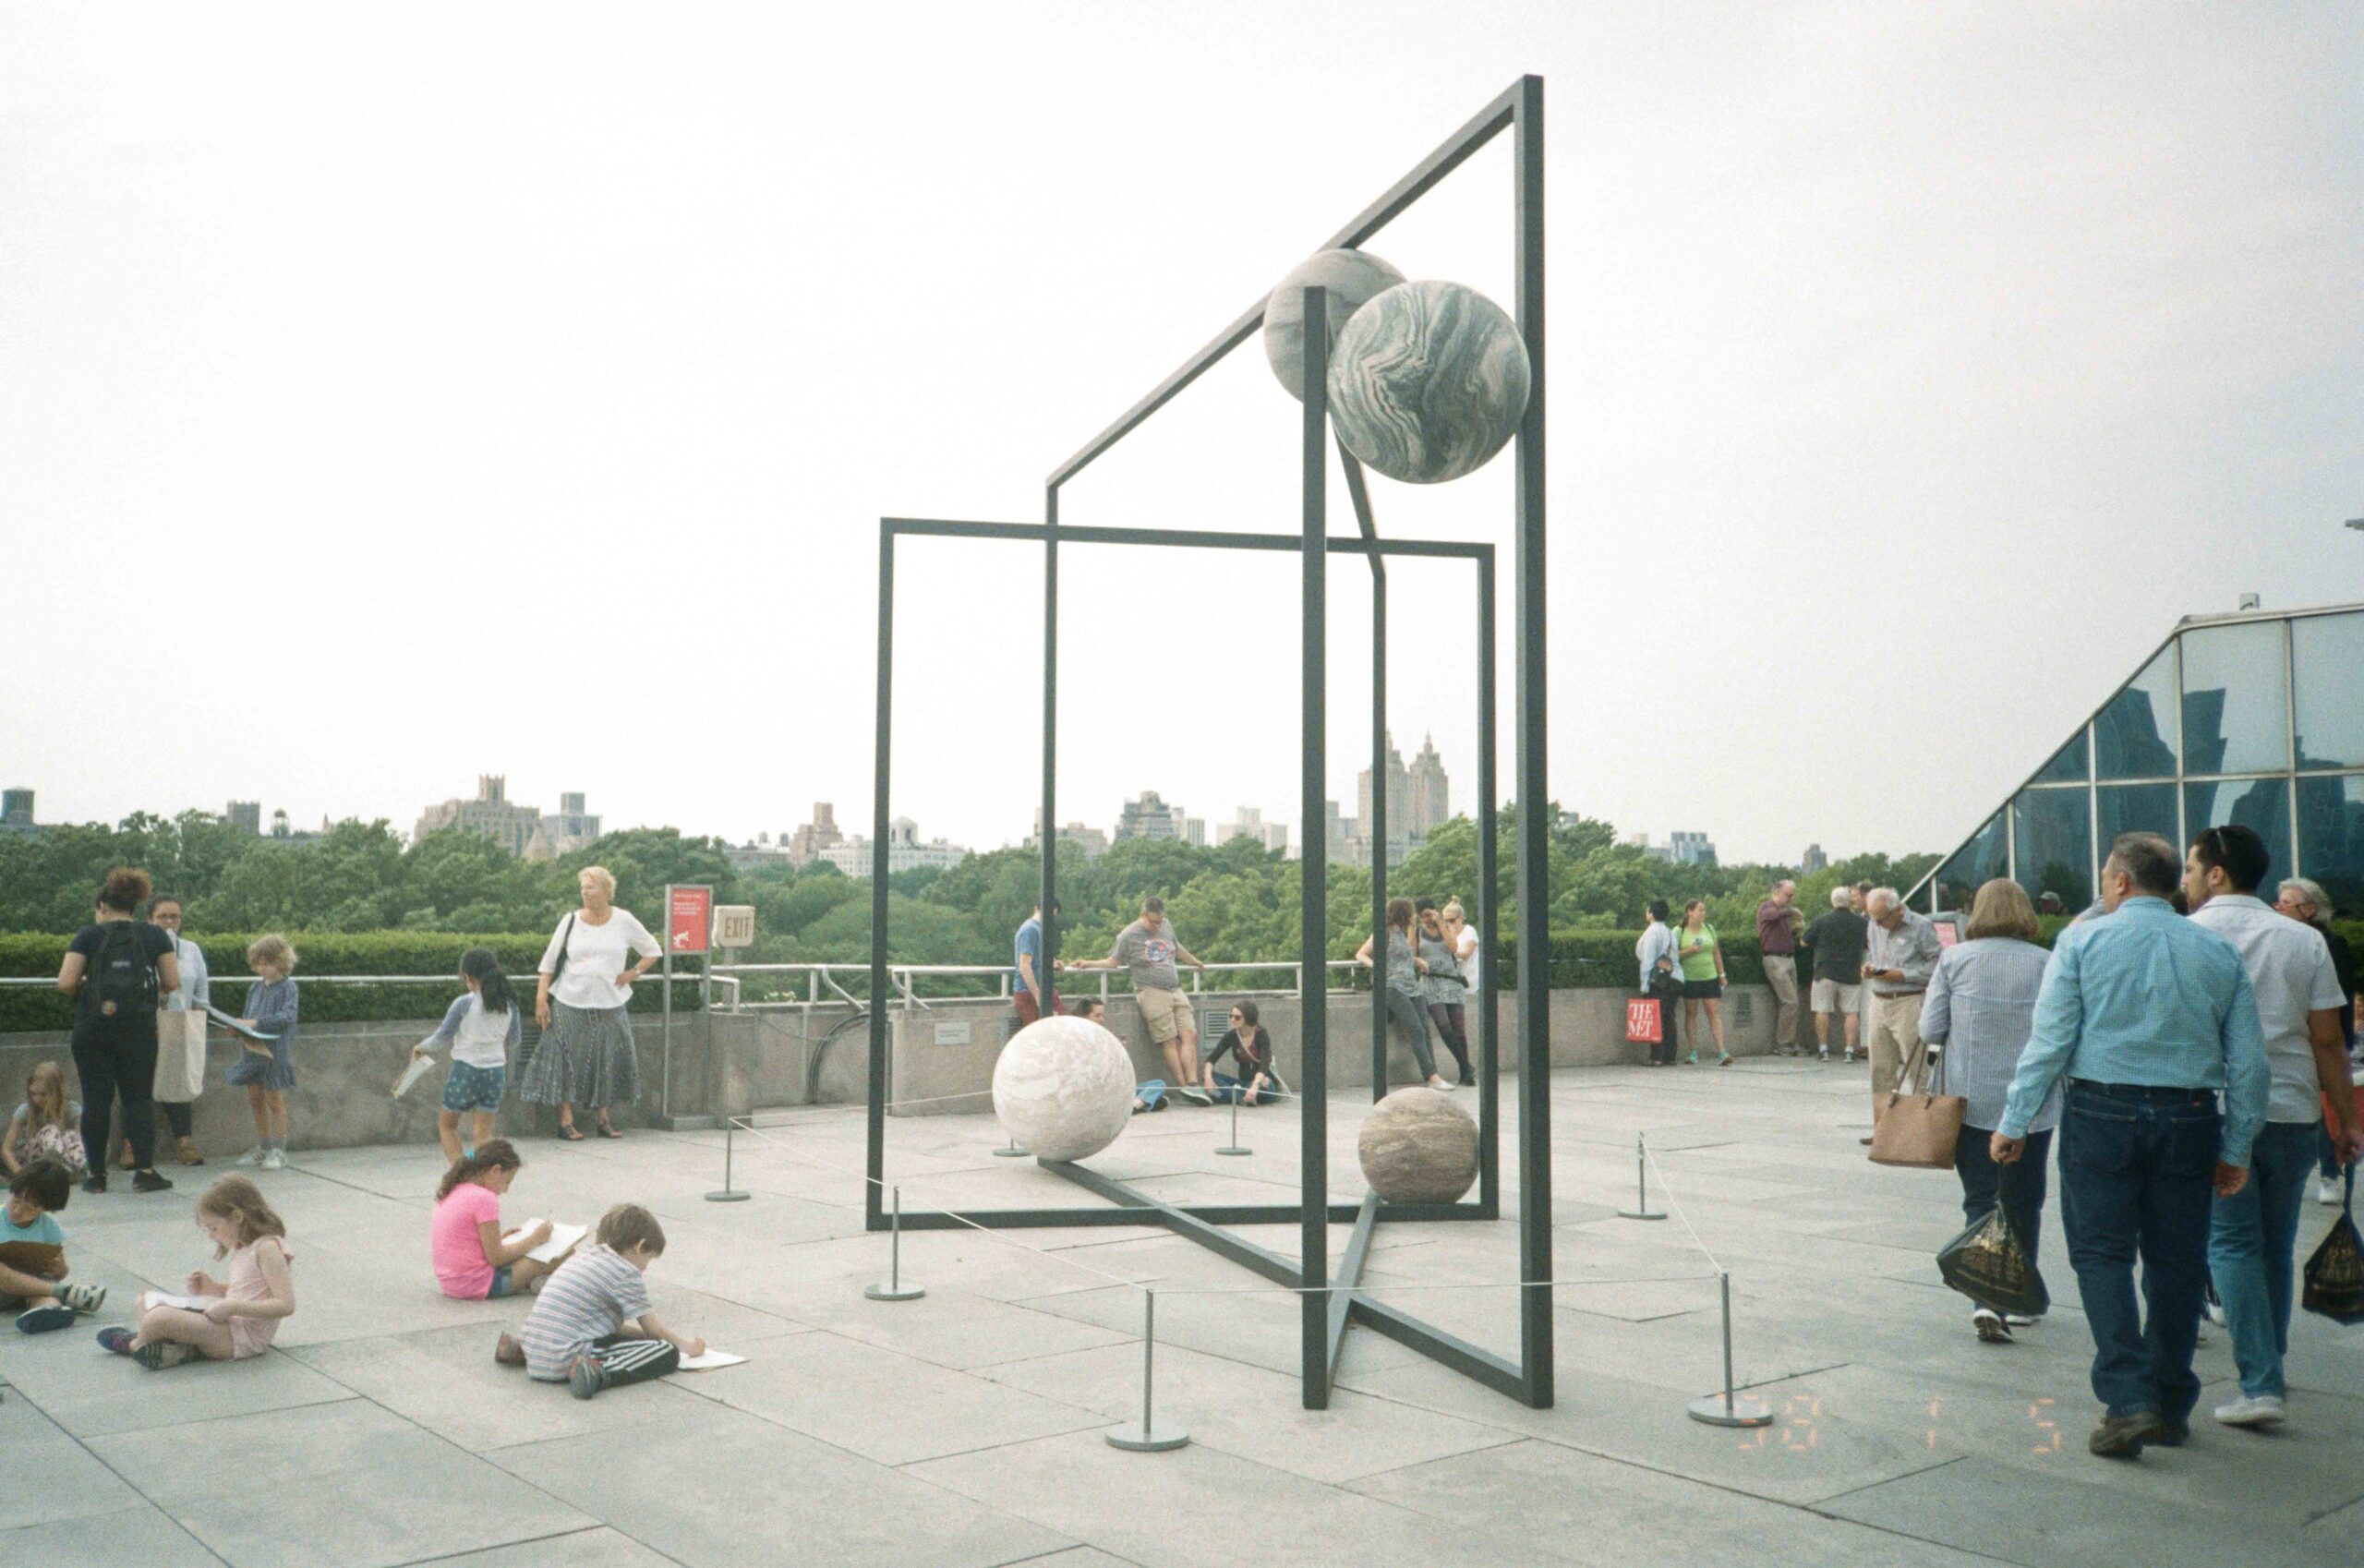 NYC-Landscape-Photos-04